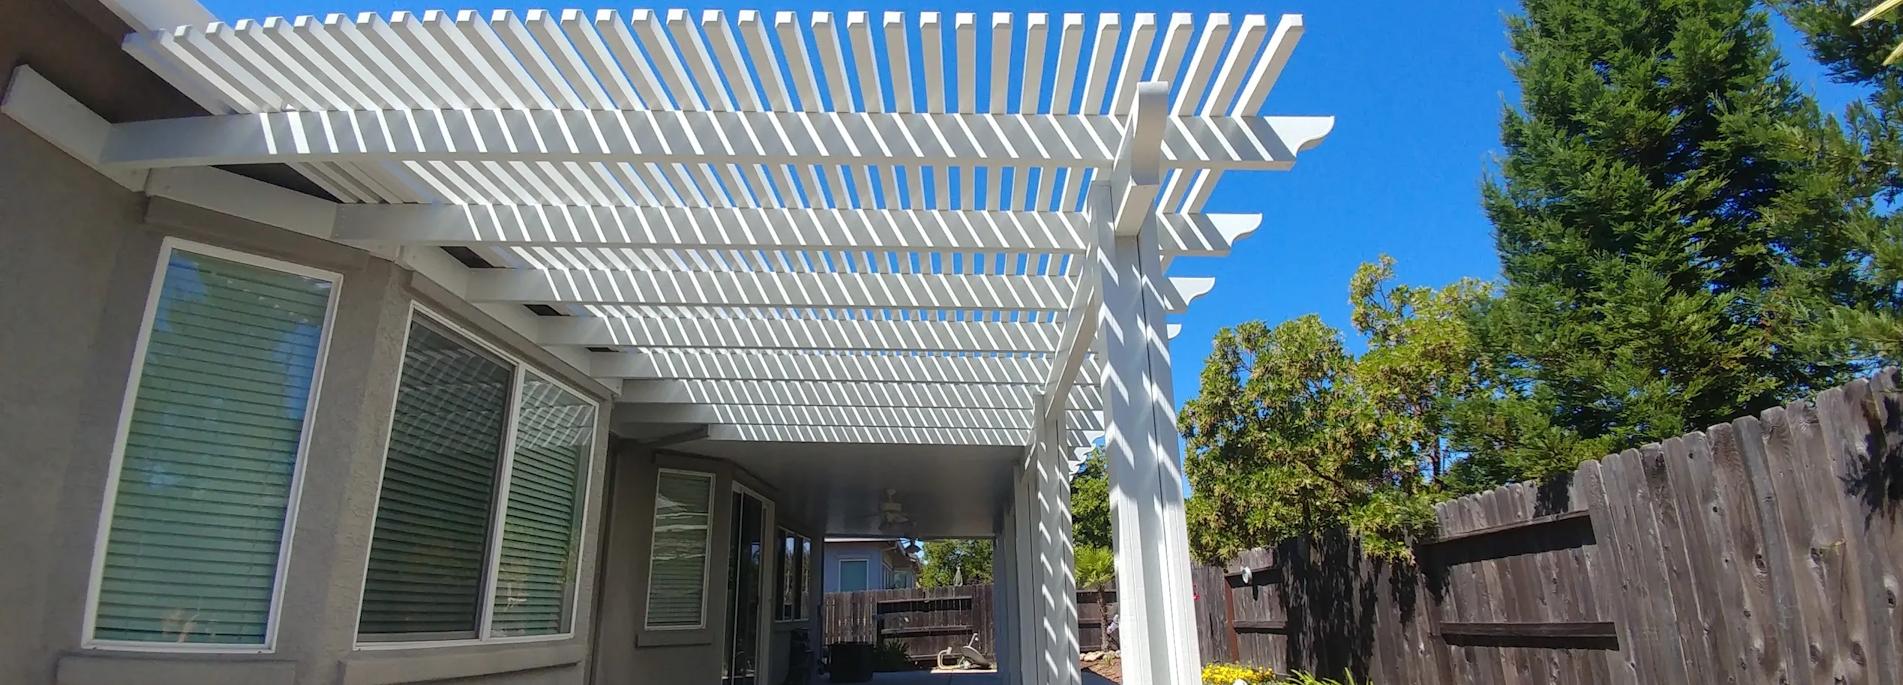 Aluminum Patio Covers Patio Cover West Sacramento Citrus Heights